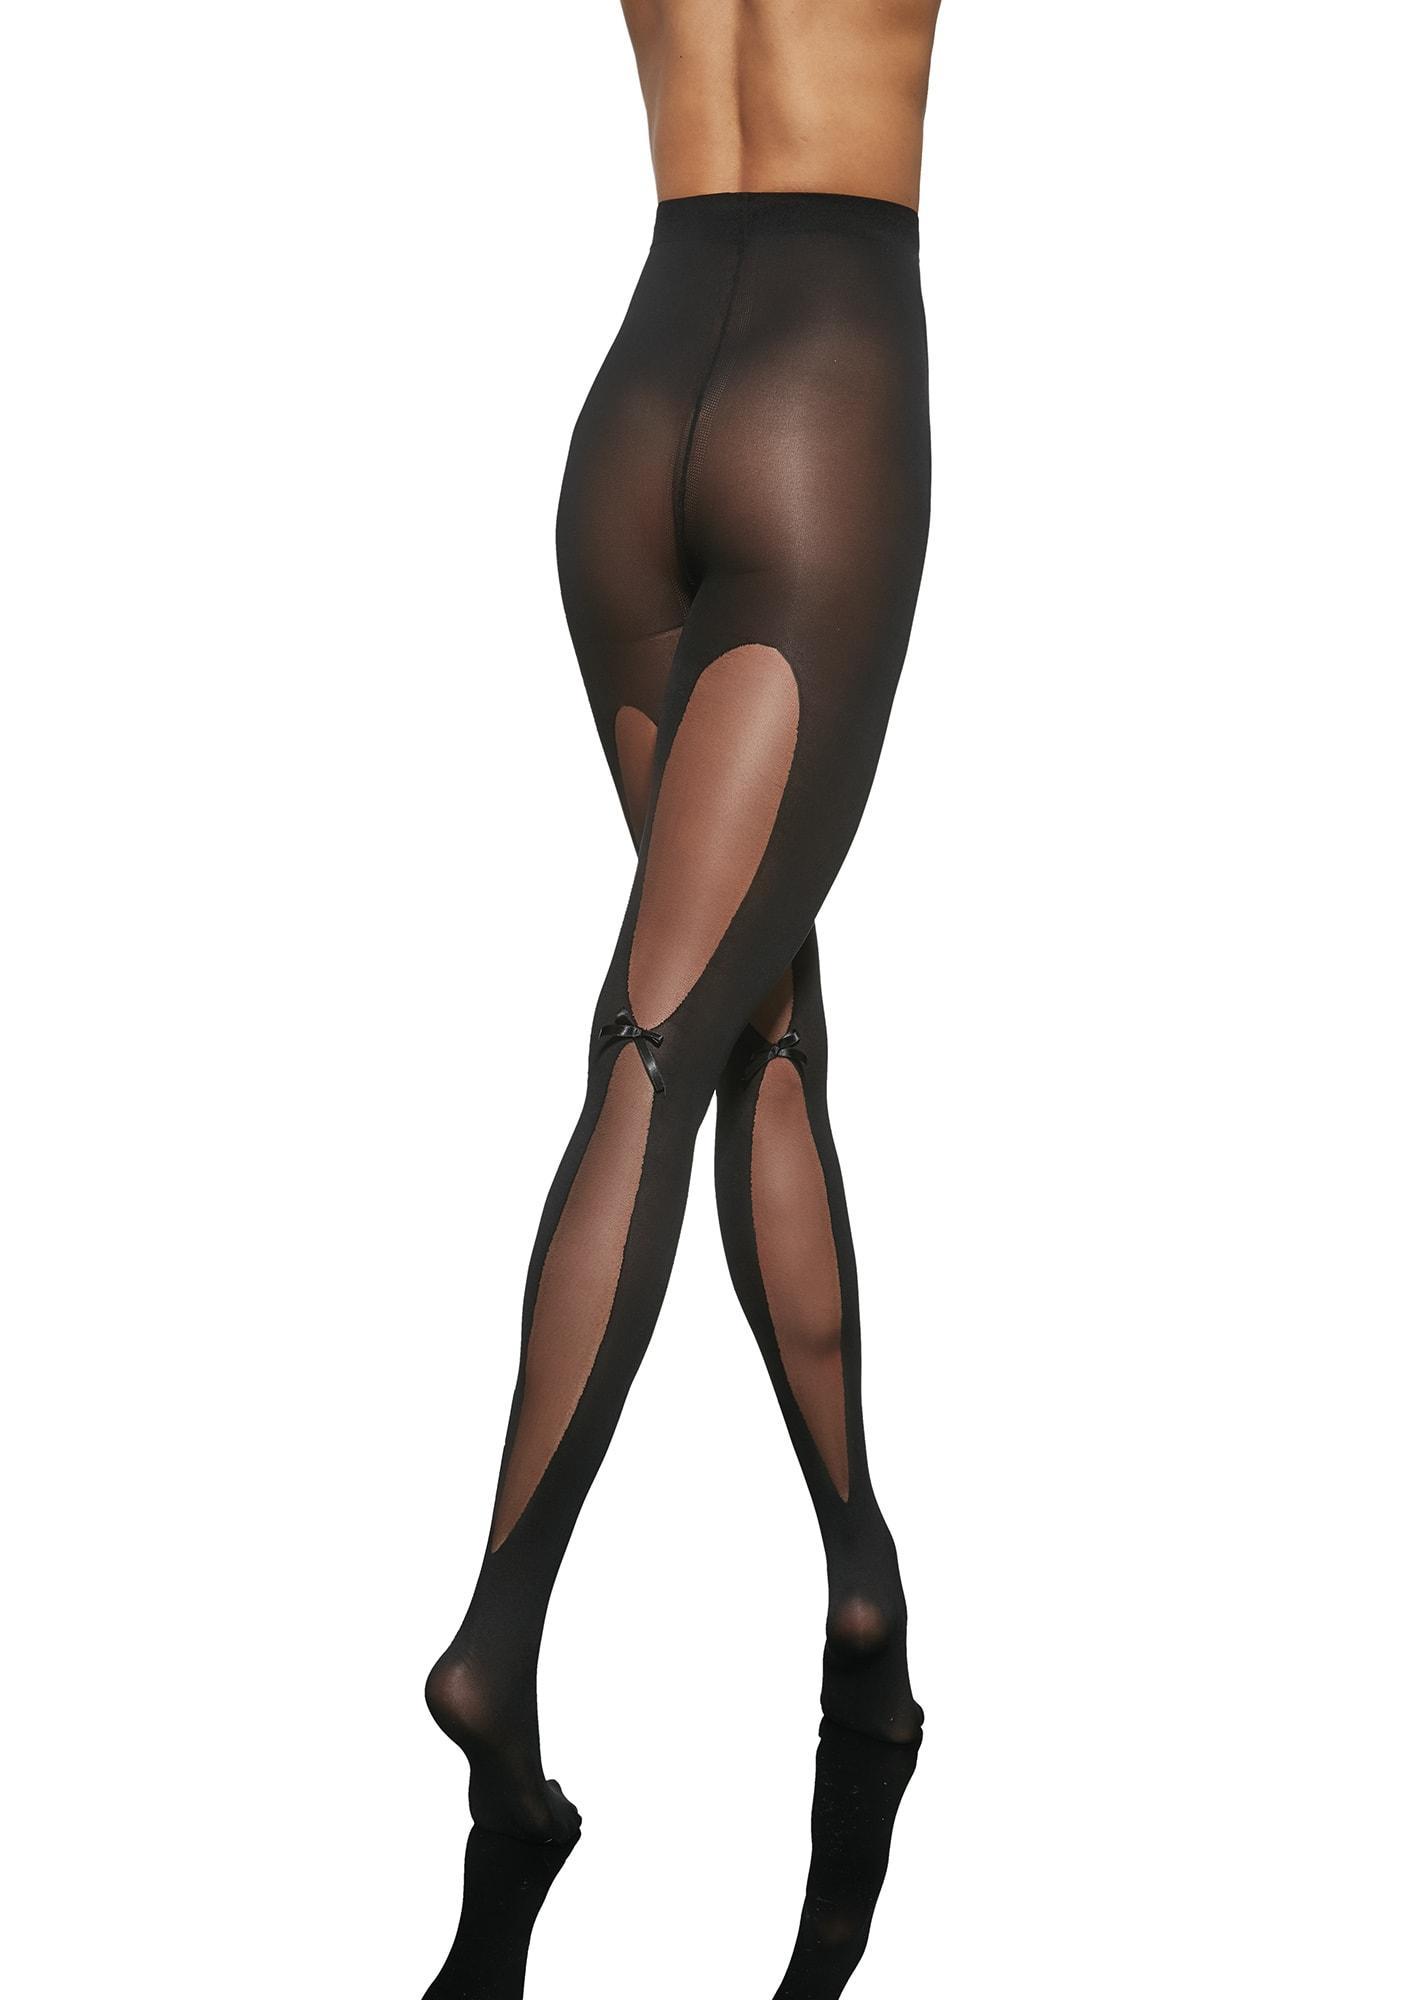 8b06e08d4ce Divine Paris Obstinee sukkpüksid | Sukkpüksid ja Sukad - Osta Divine ...